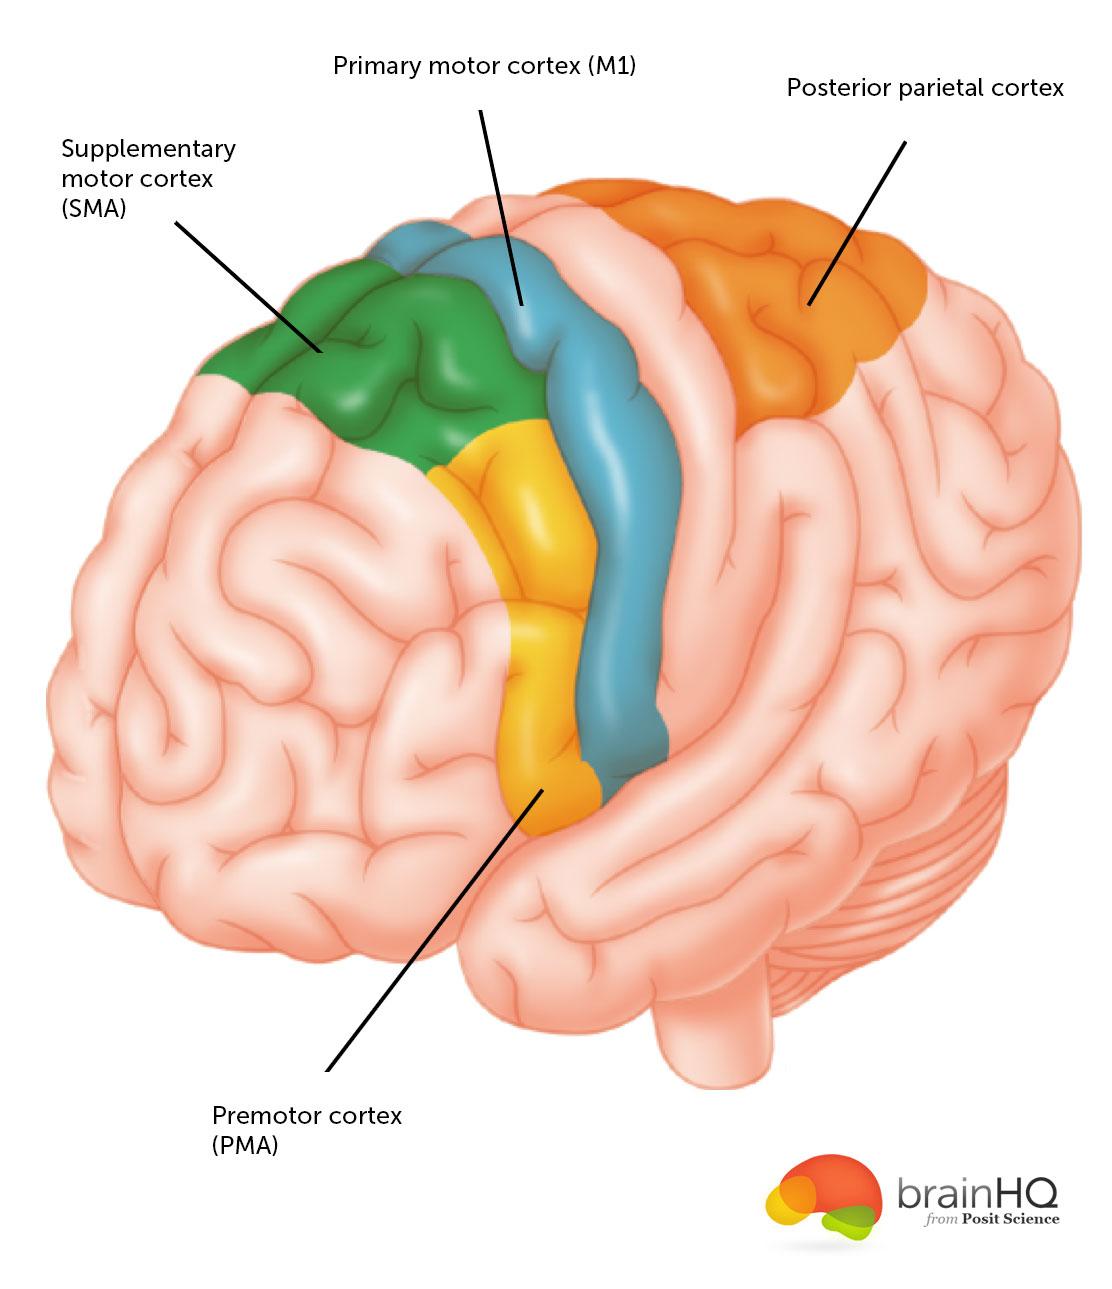 Brain Anatomy Image Gallery - BrainHQ from Posit Science